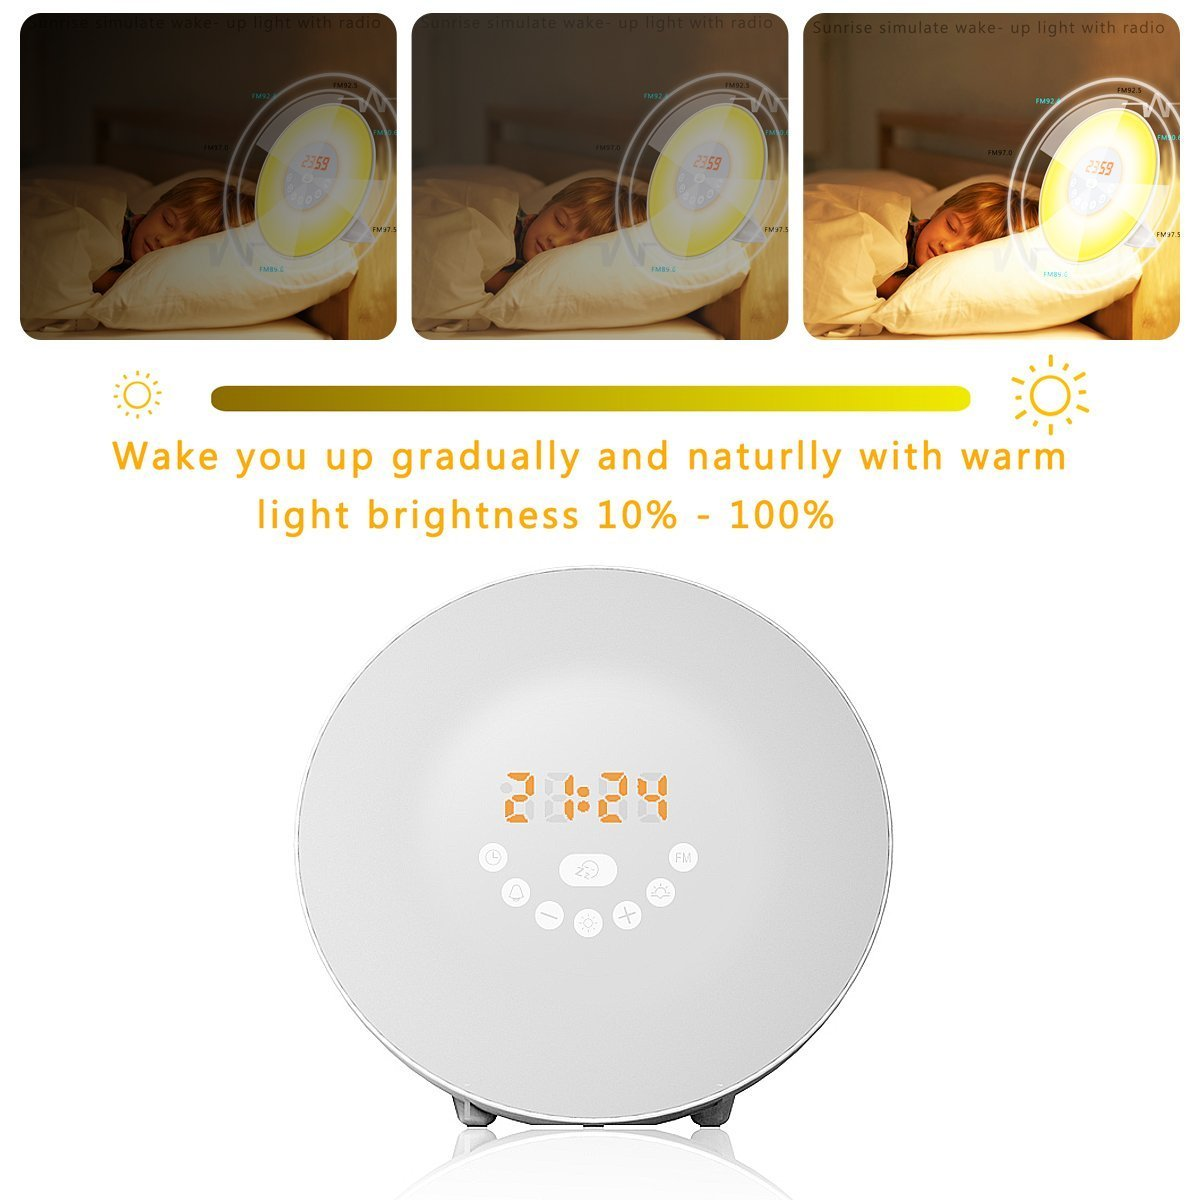 Sunrise Alarm Clock Digital Clock Wake Up Light With 6 Nature Sounds FM  Radio And Touch Control: Amazon.com.au: Home